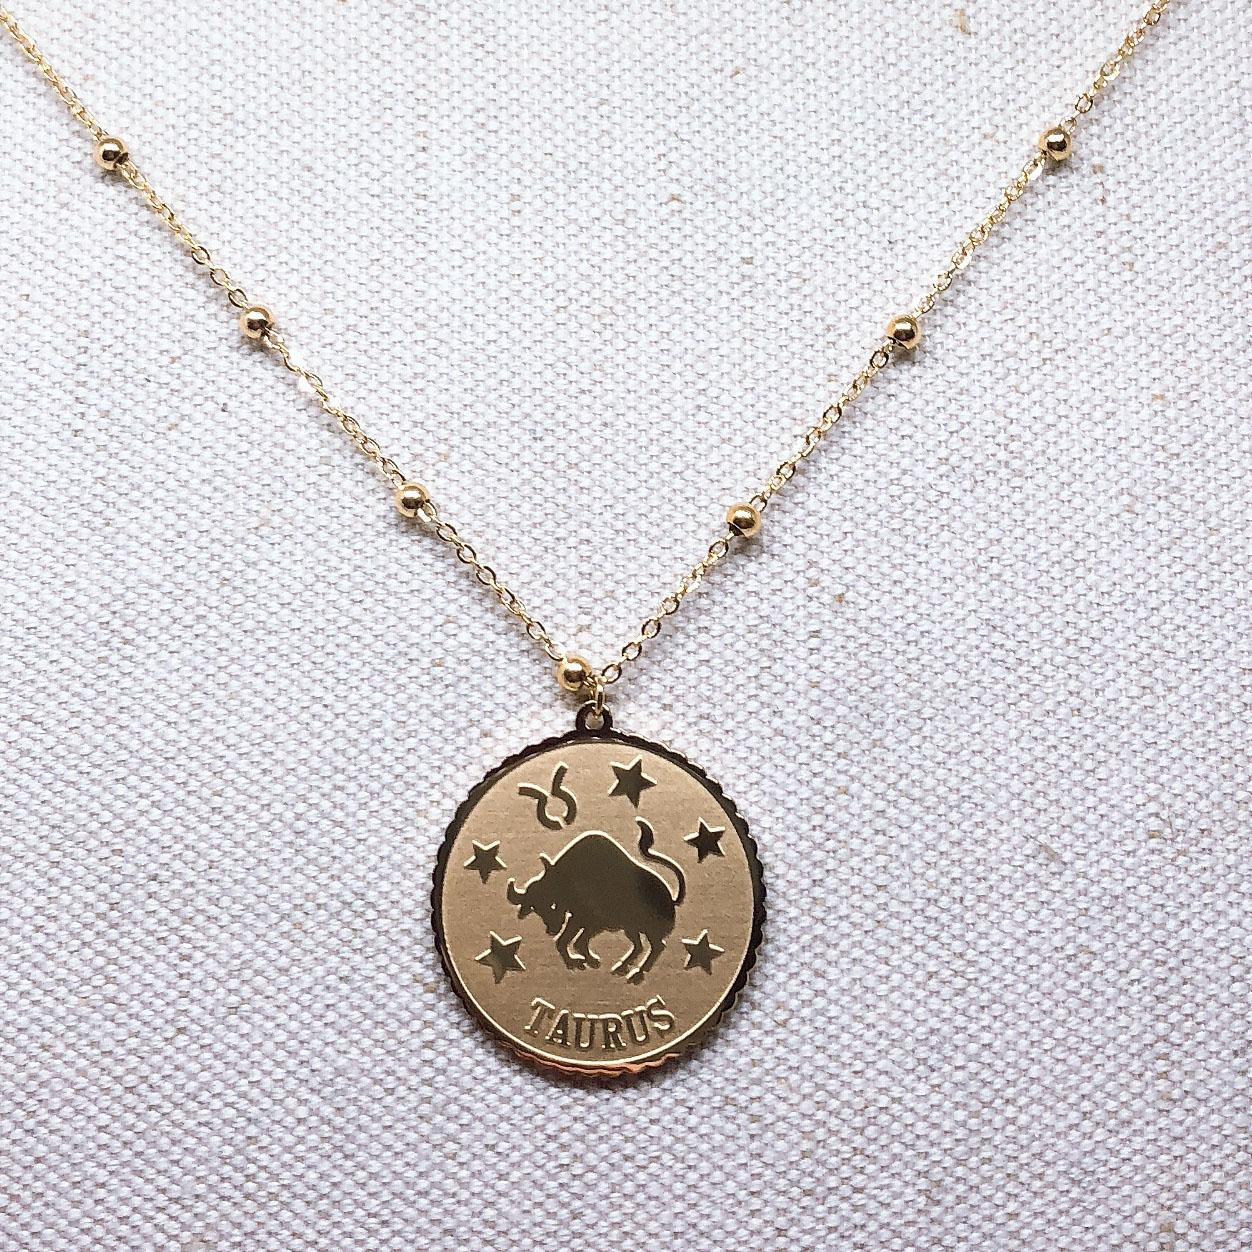 collier-femme-or-taureau